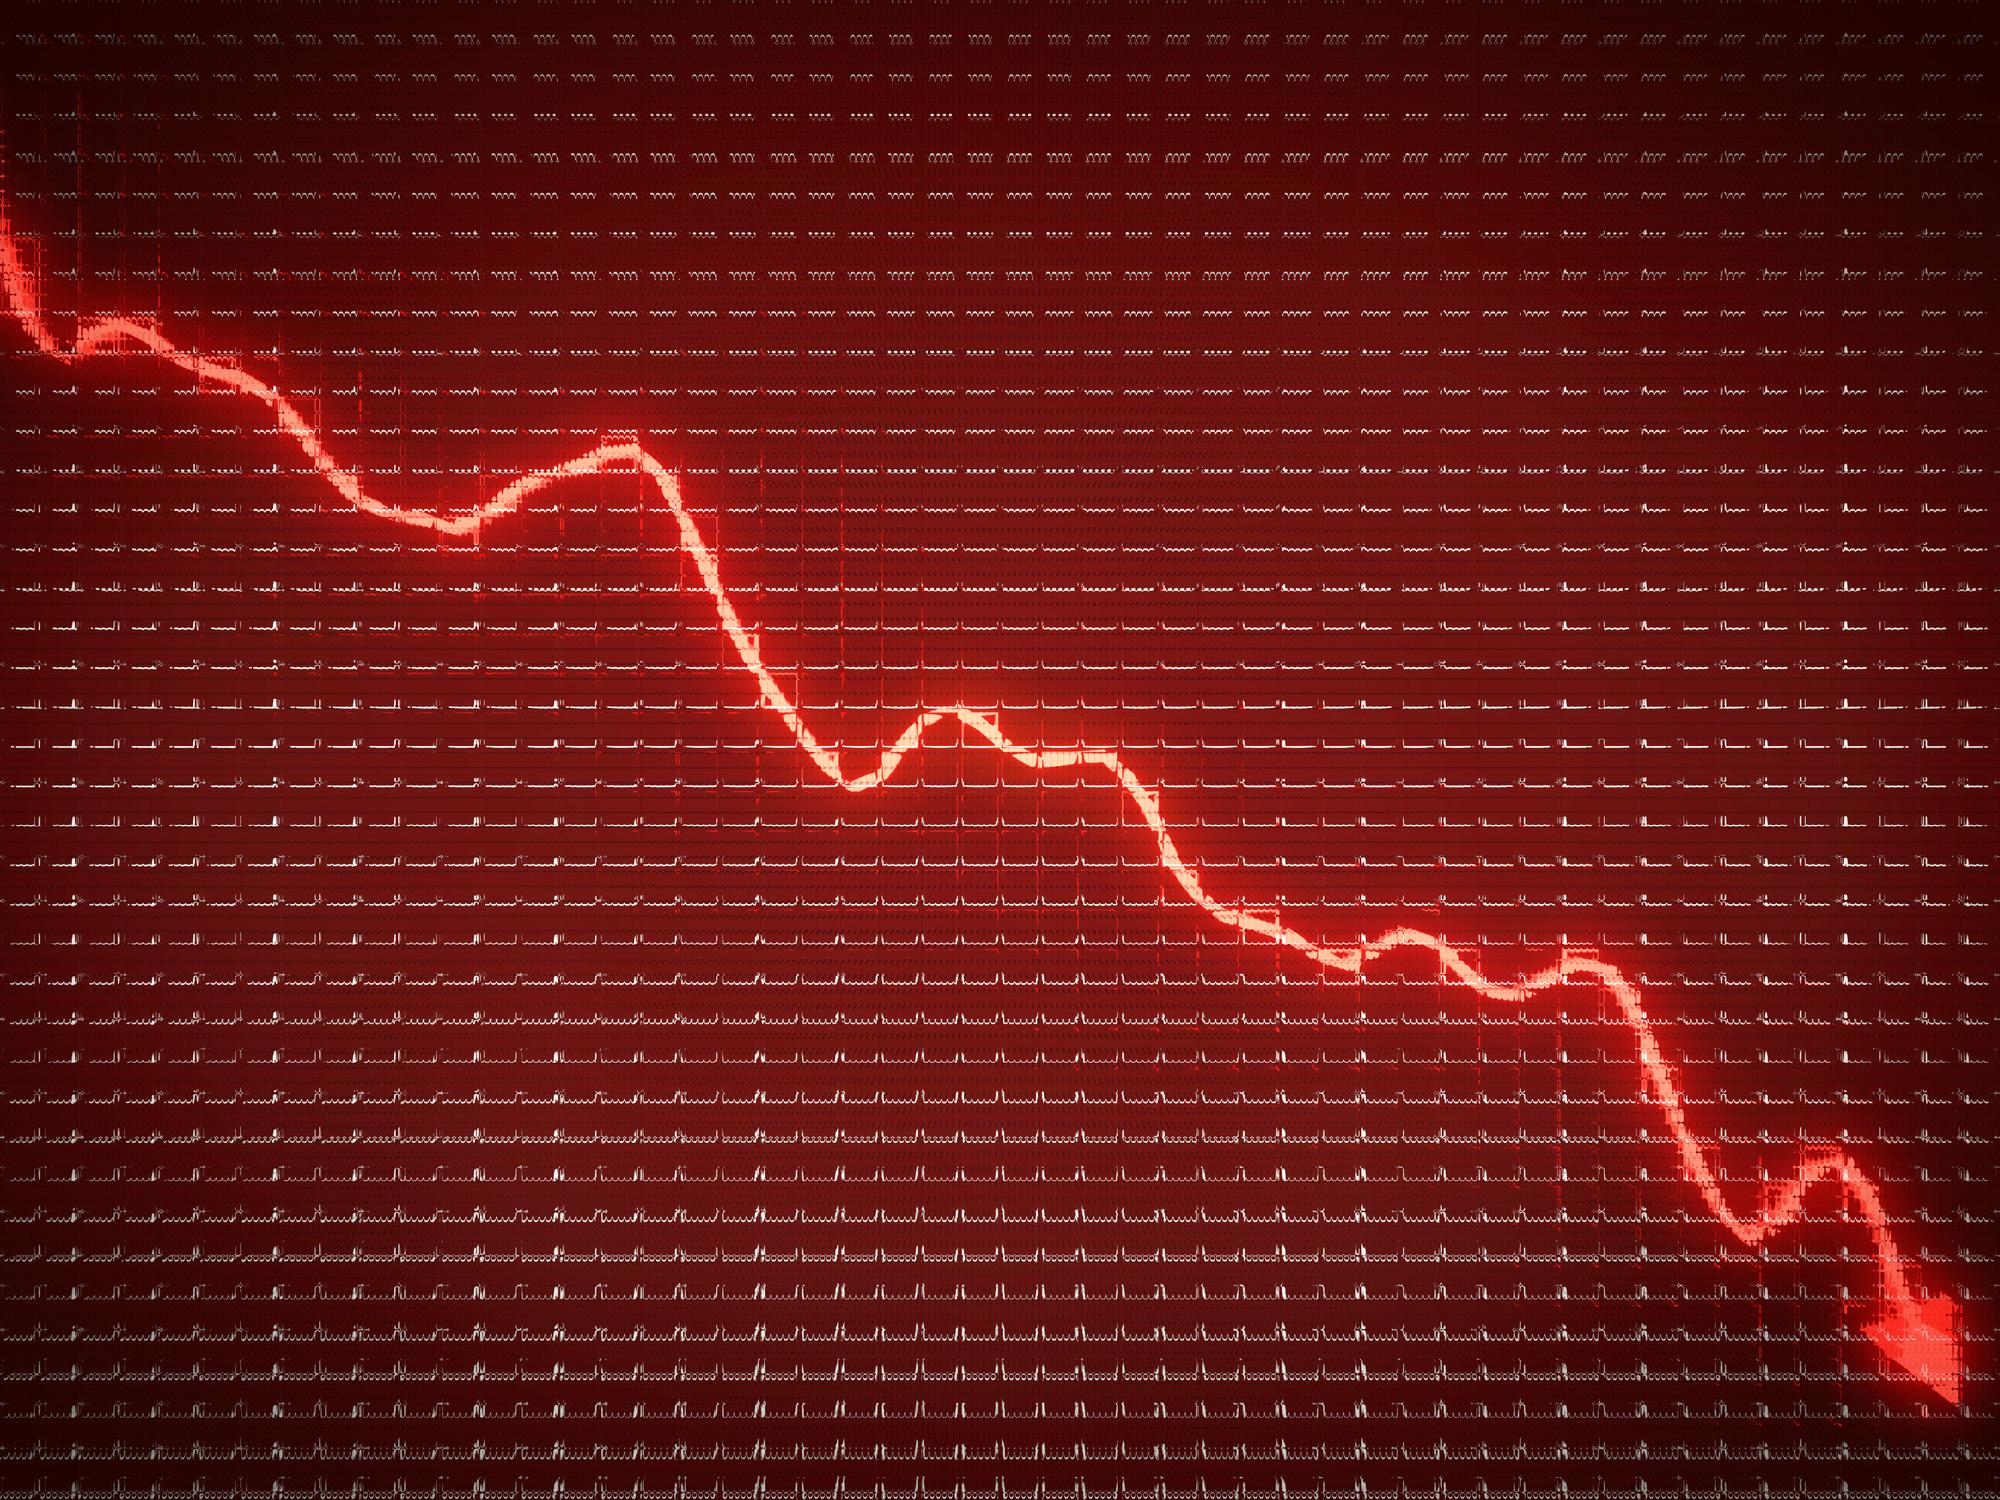 Glowing red stock arrow trending down